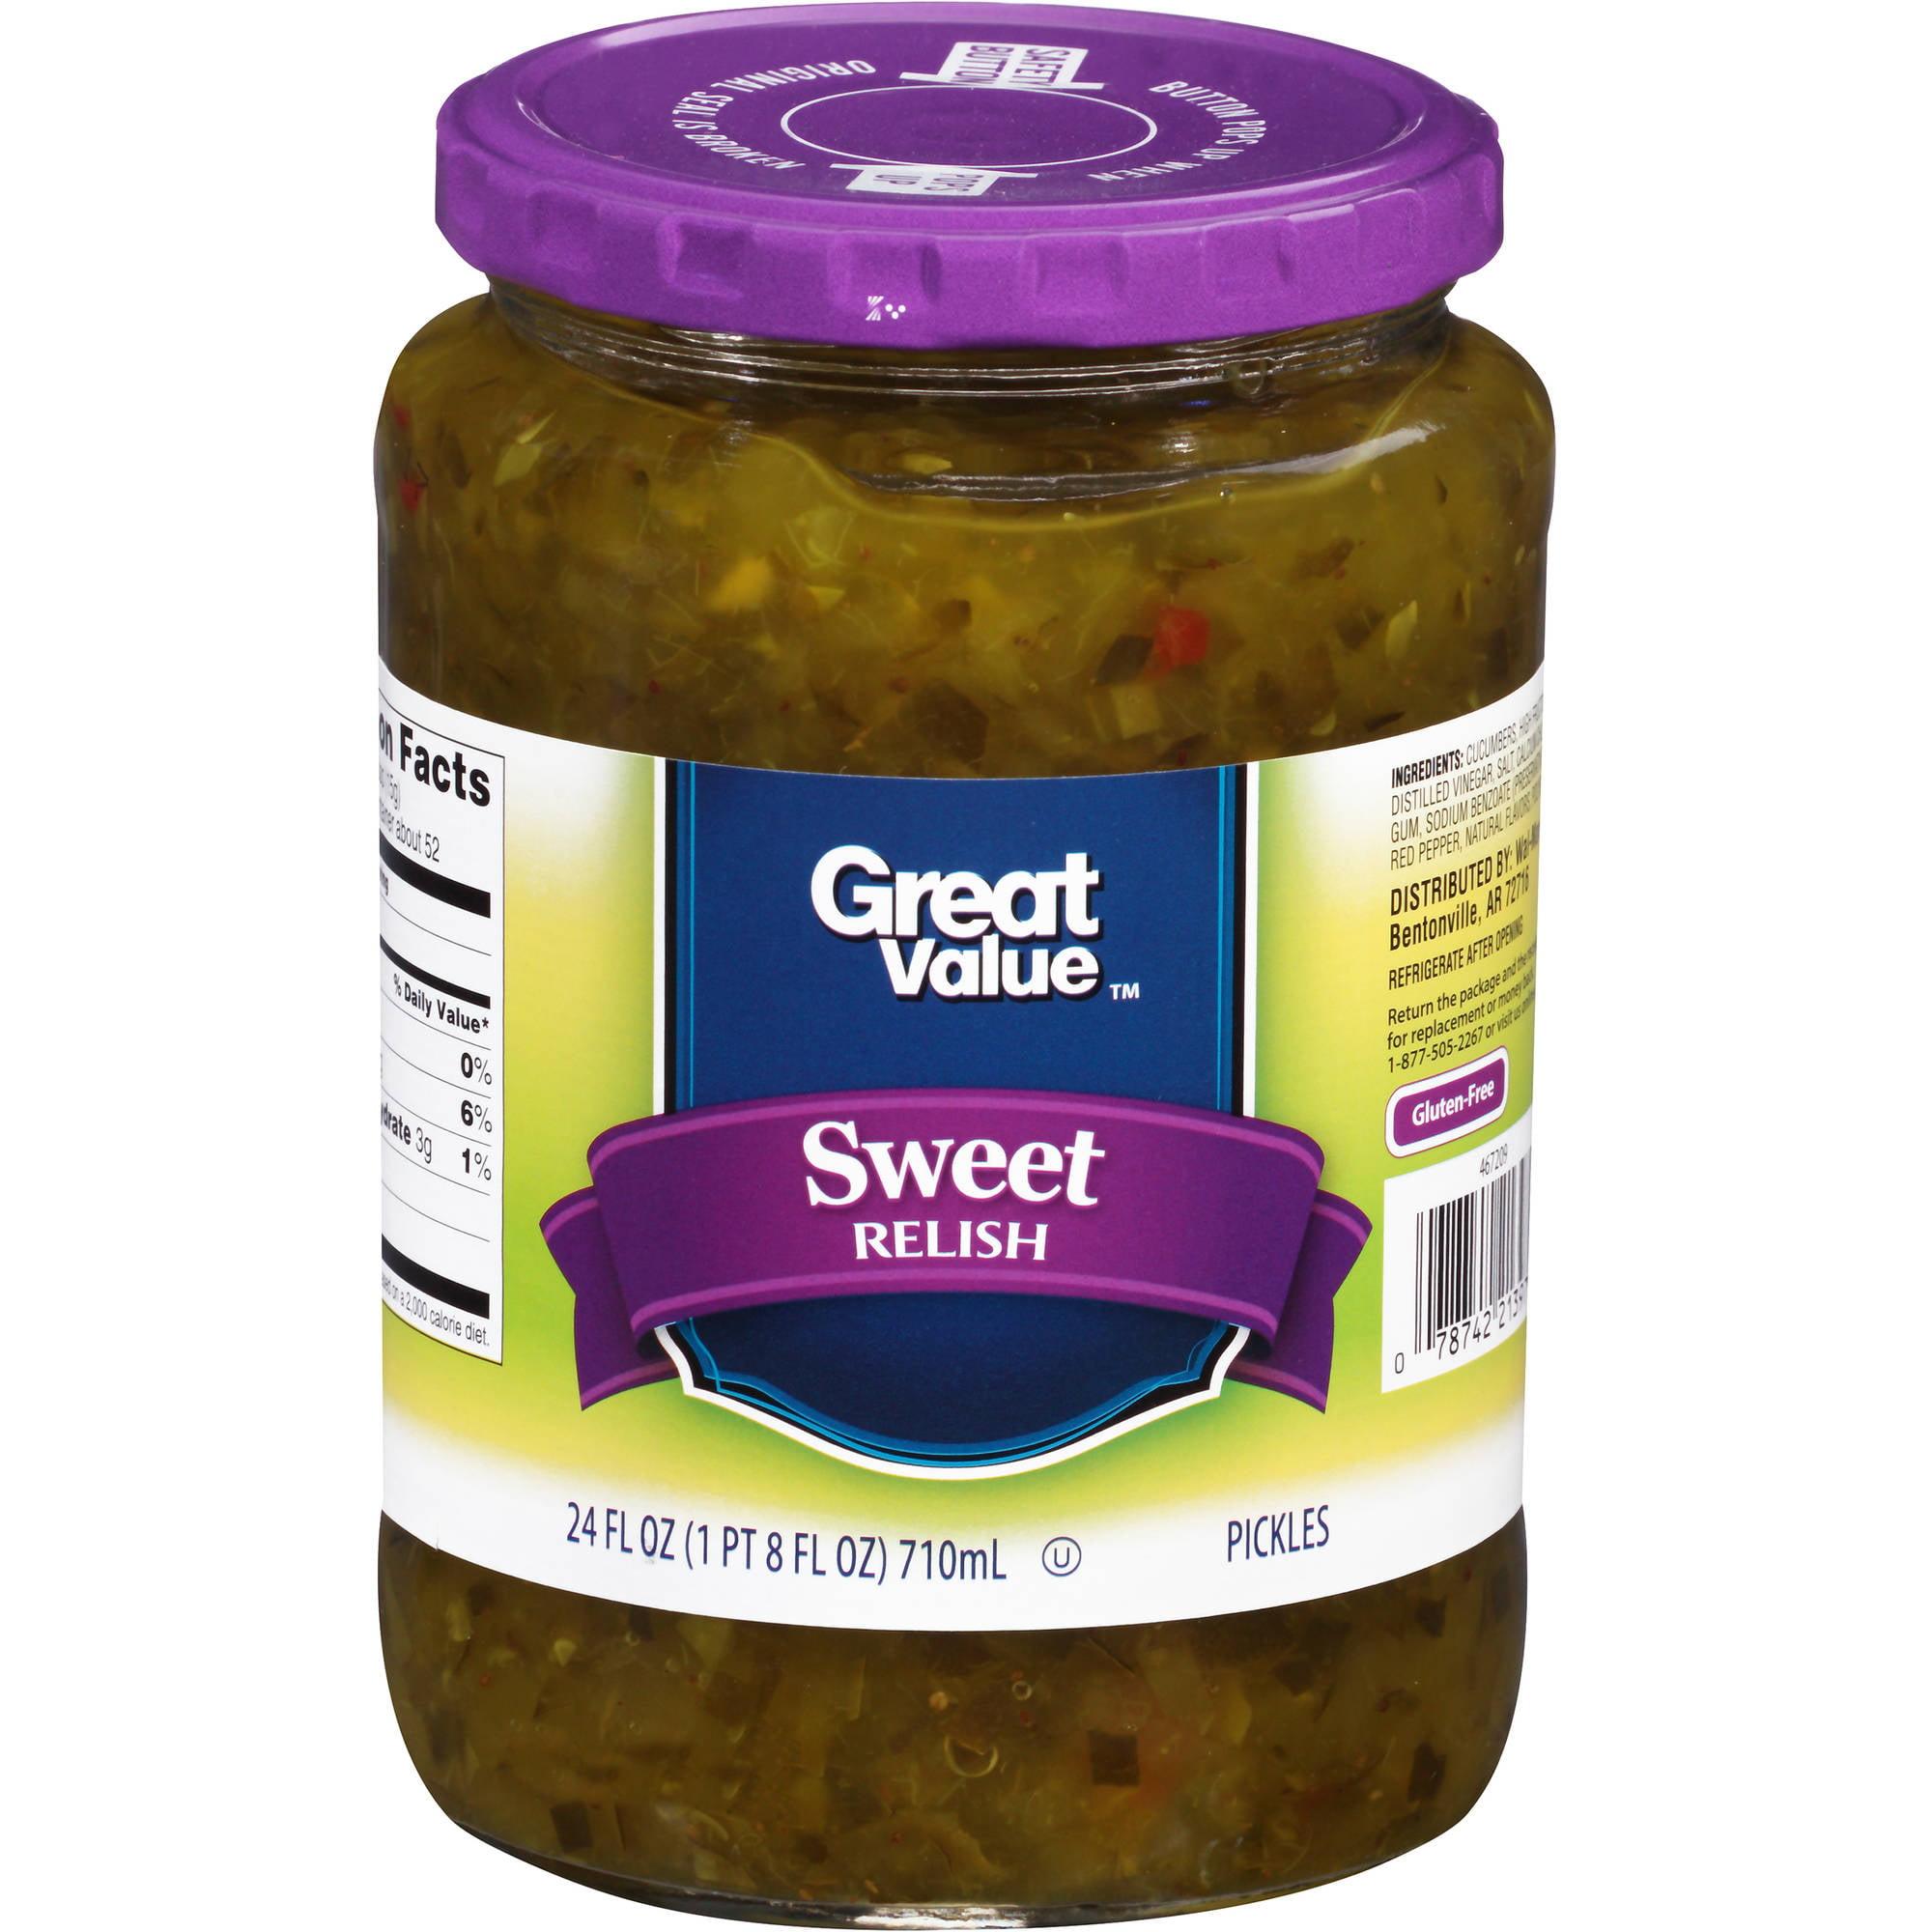 Great Value Sweet Relish, 24 fl oz